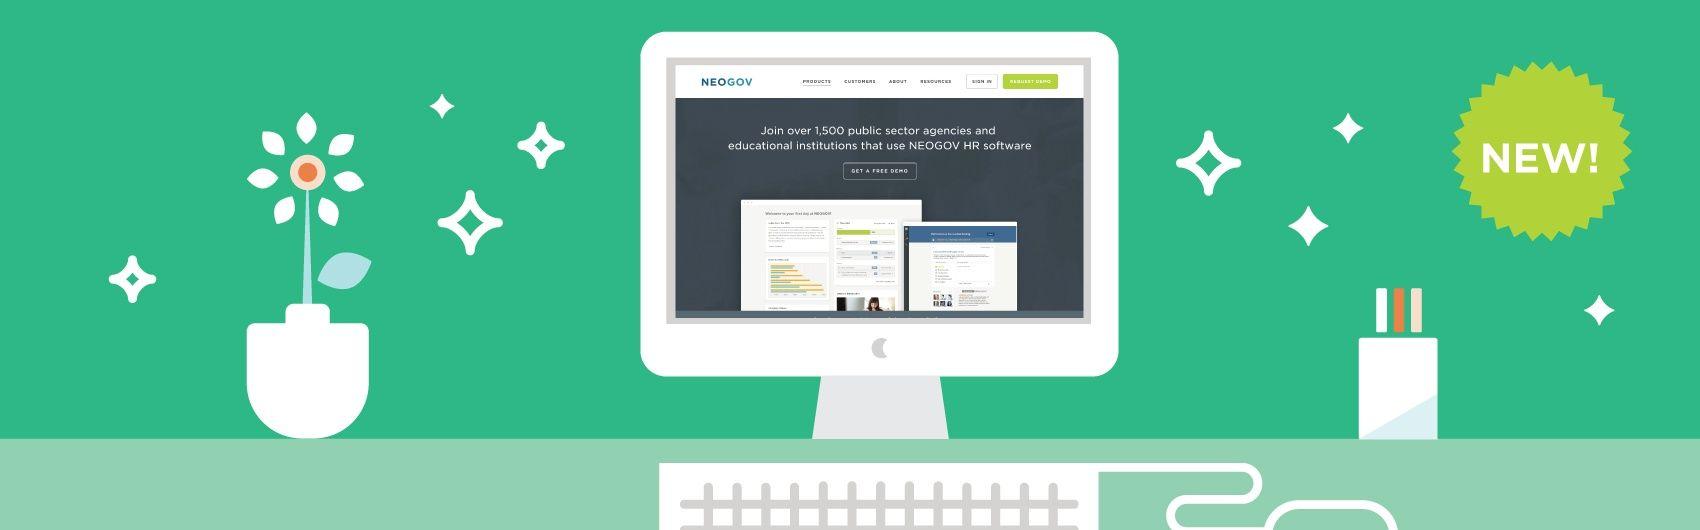 NEOGOV Launches Redesigned Website